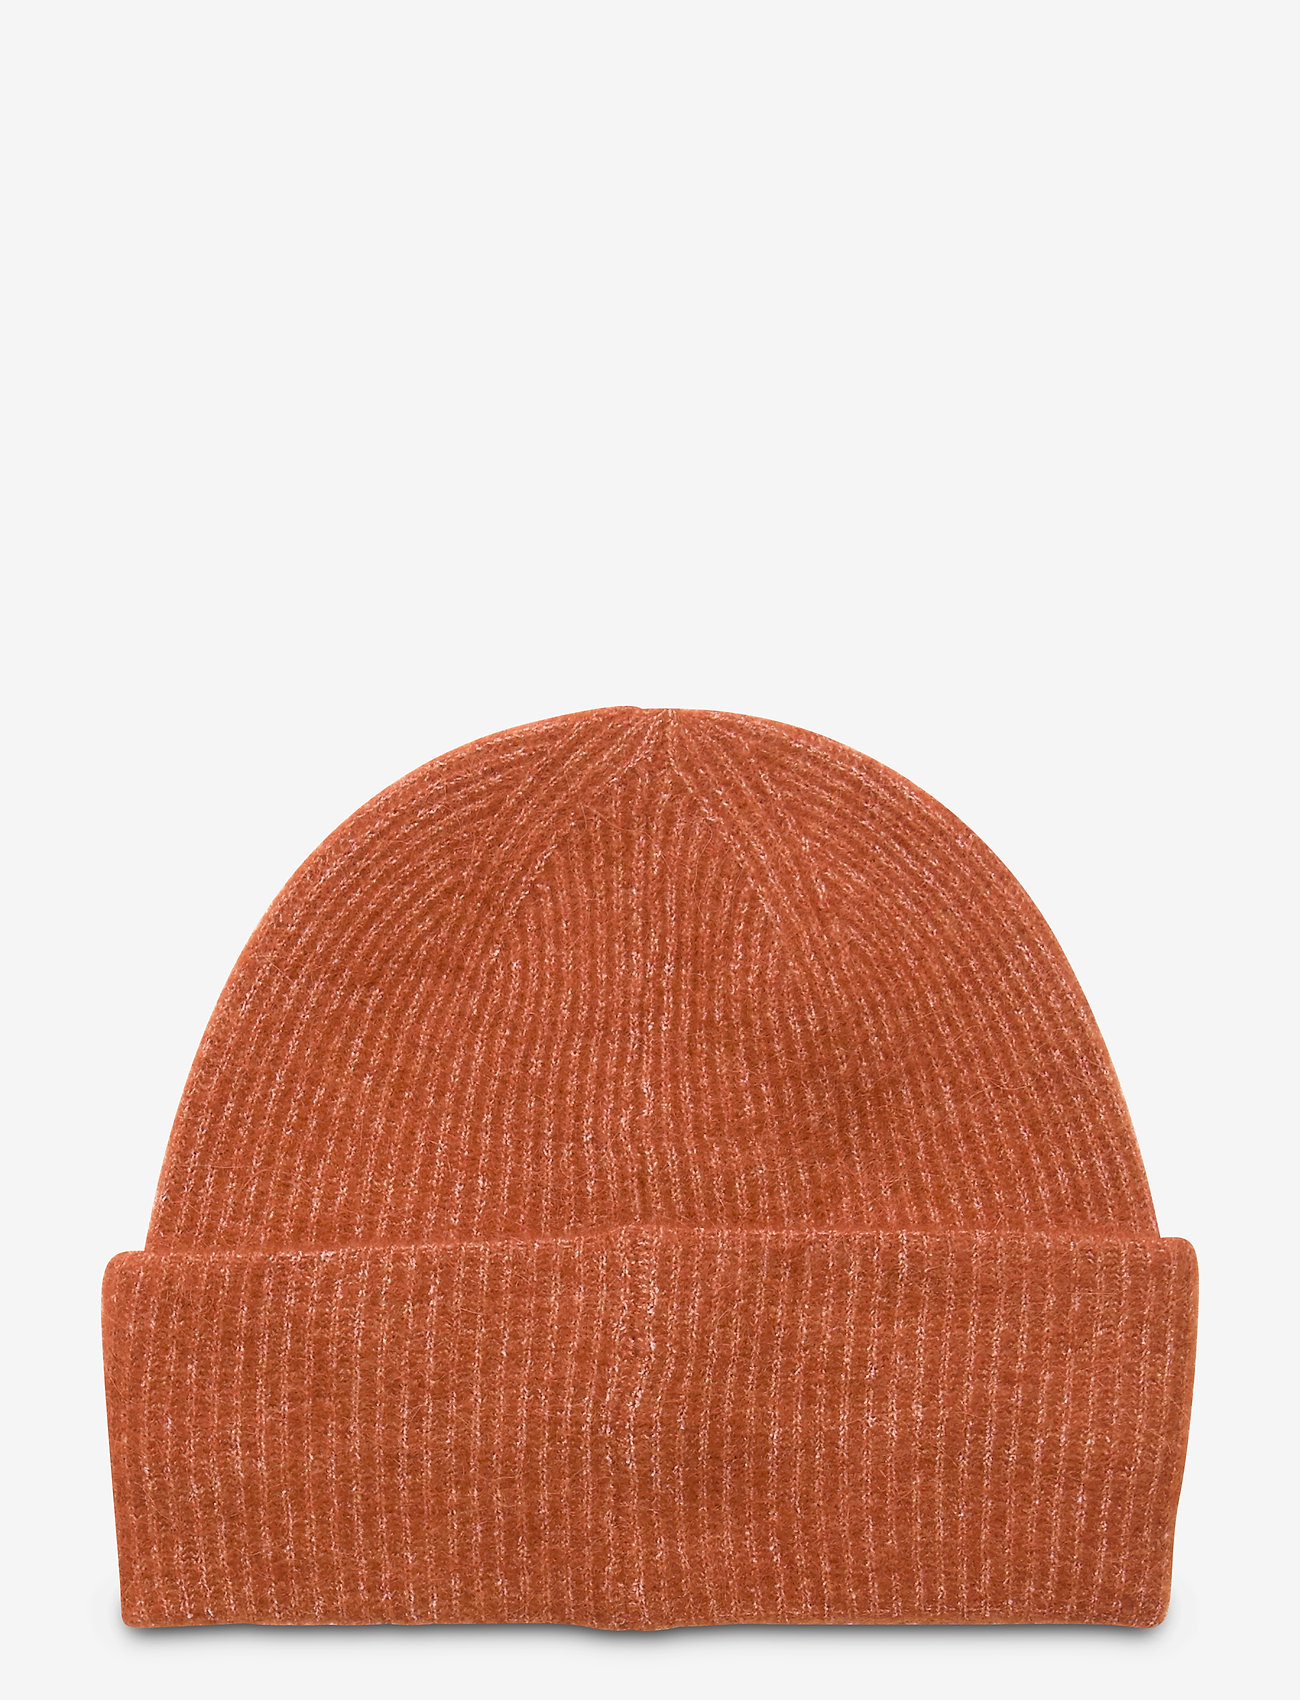 Samsøe Samsøe Nor hat 7355 - Czapki i kapelusze PICANTE MEL. - Akcesoria